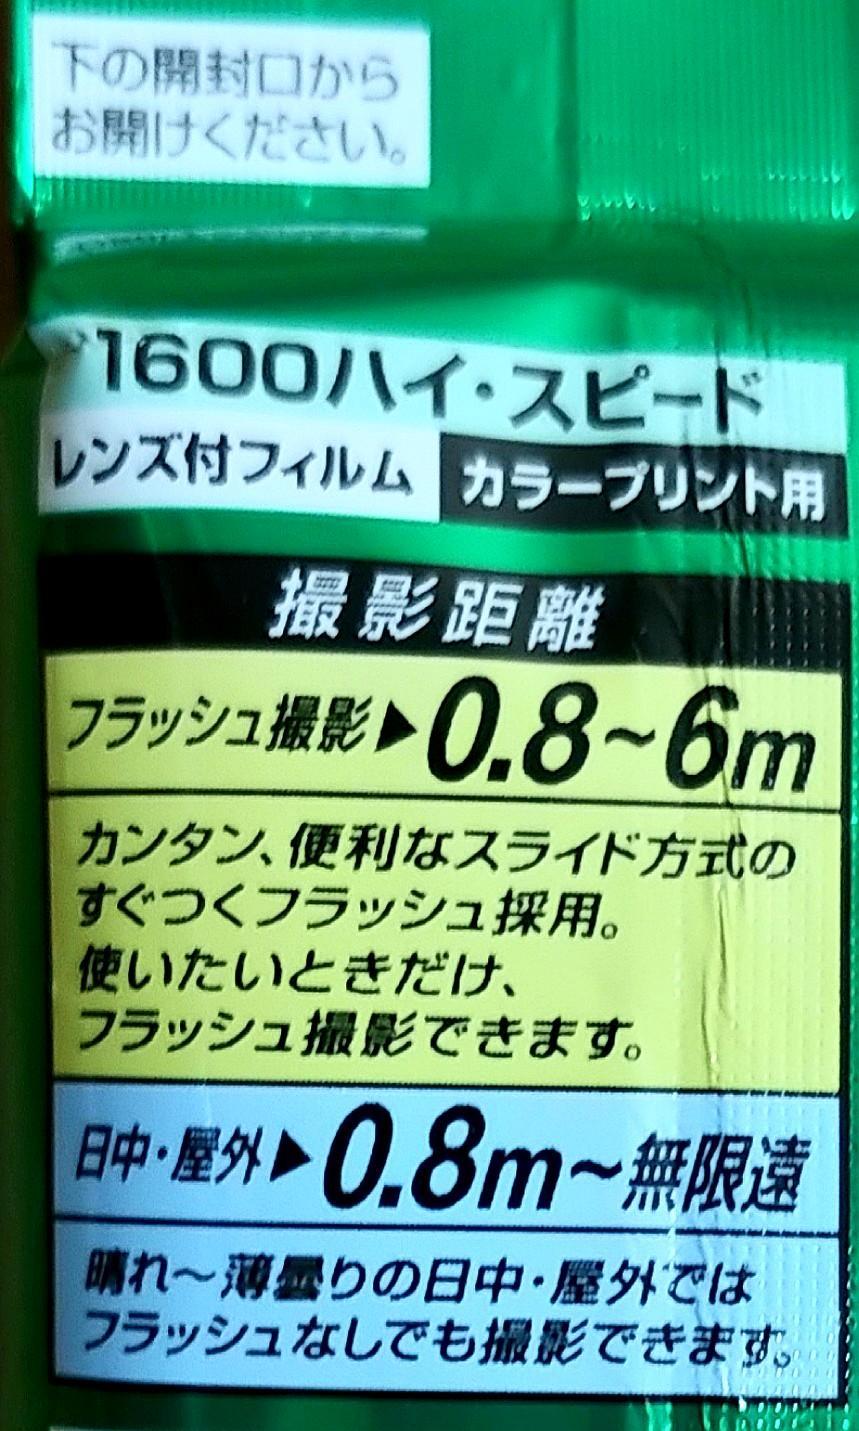 Fujifilm富士即棄相機(日本版)ISO感光度1600。復古QuickSnap